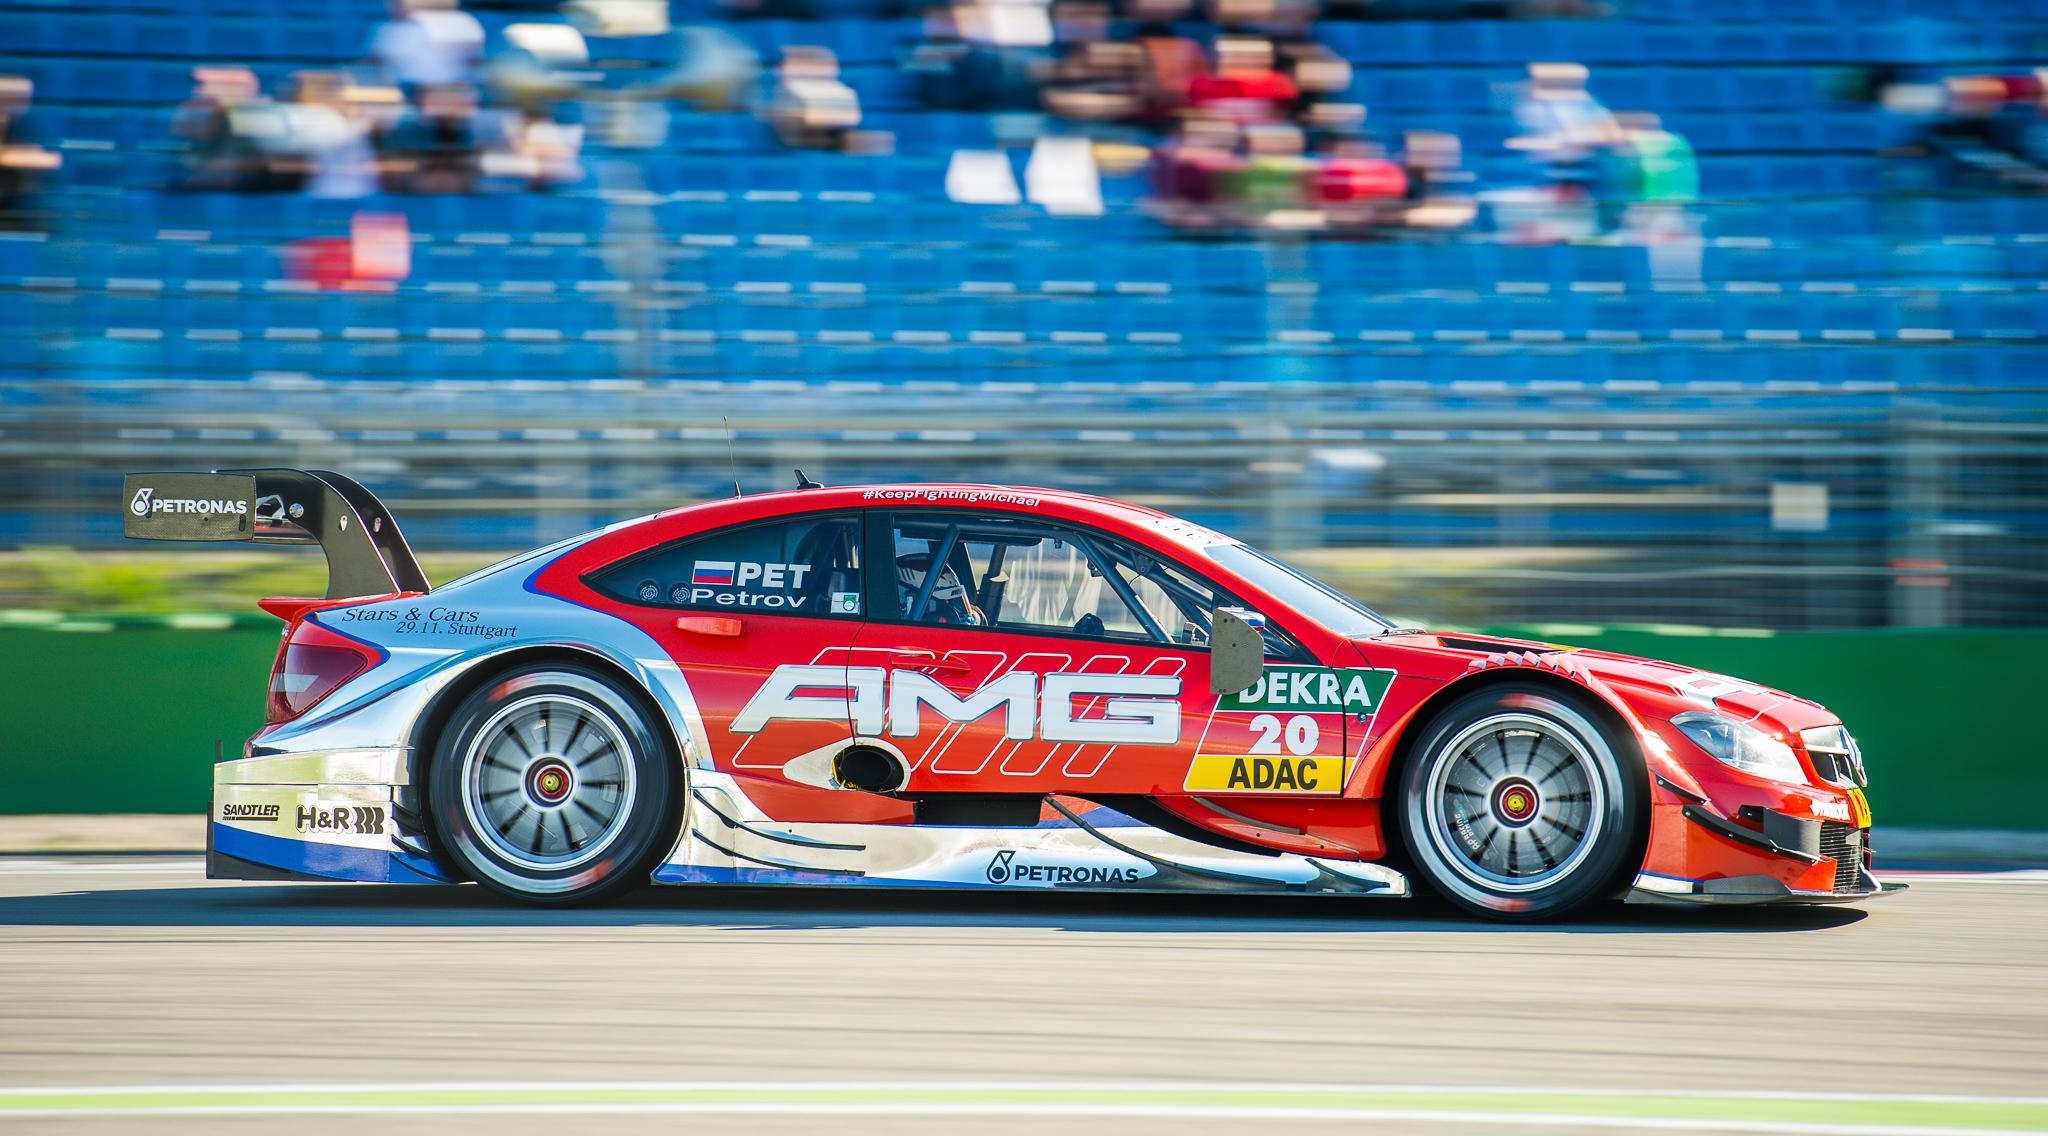 File:2014 DTM HockenheimringII Vitaly Petrov by 2eight DSC7270.jpg ...